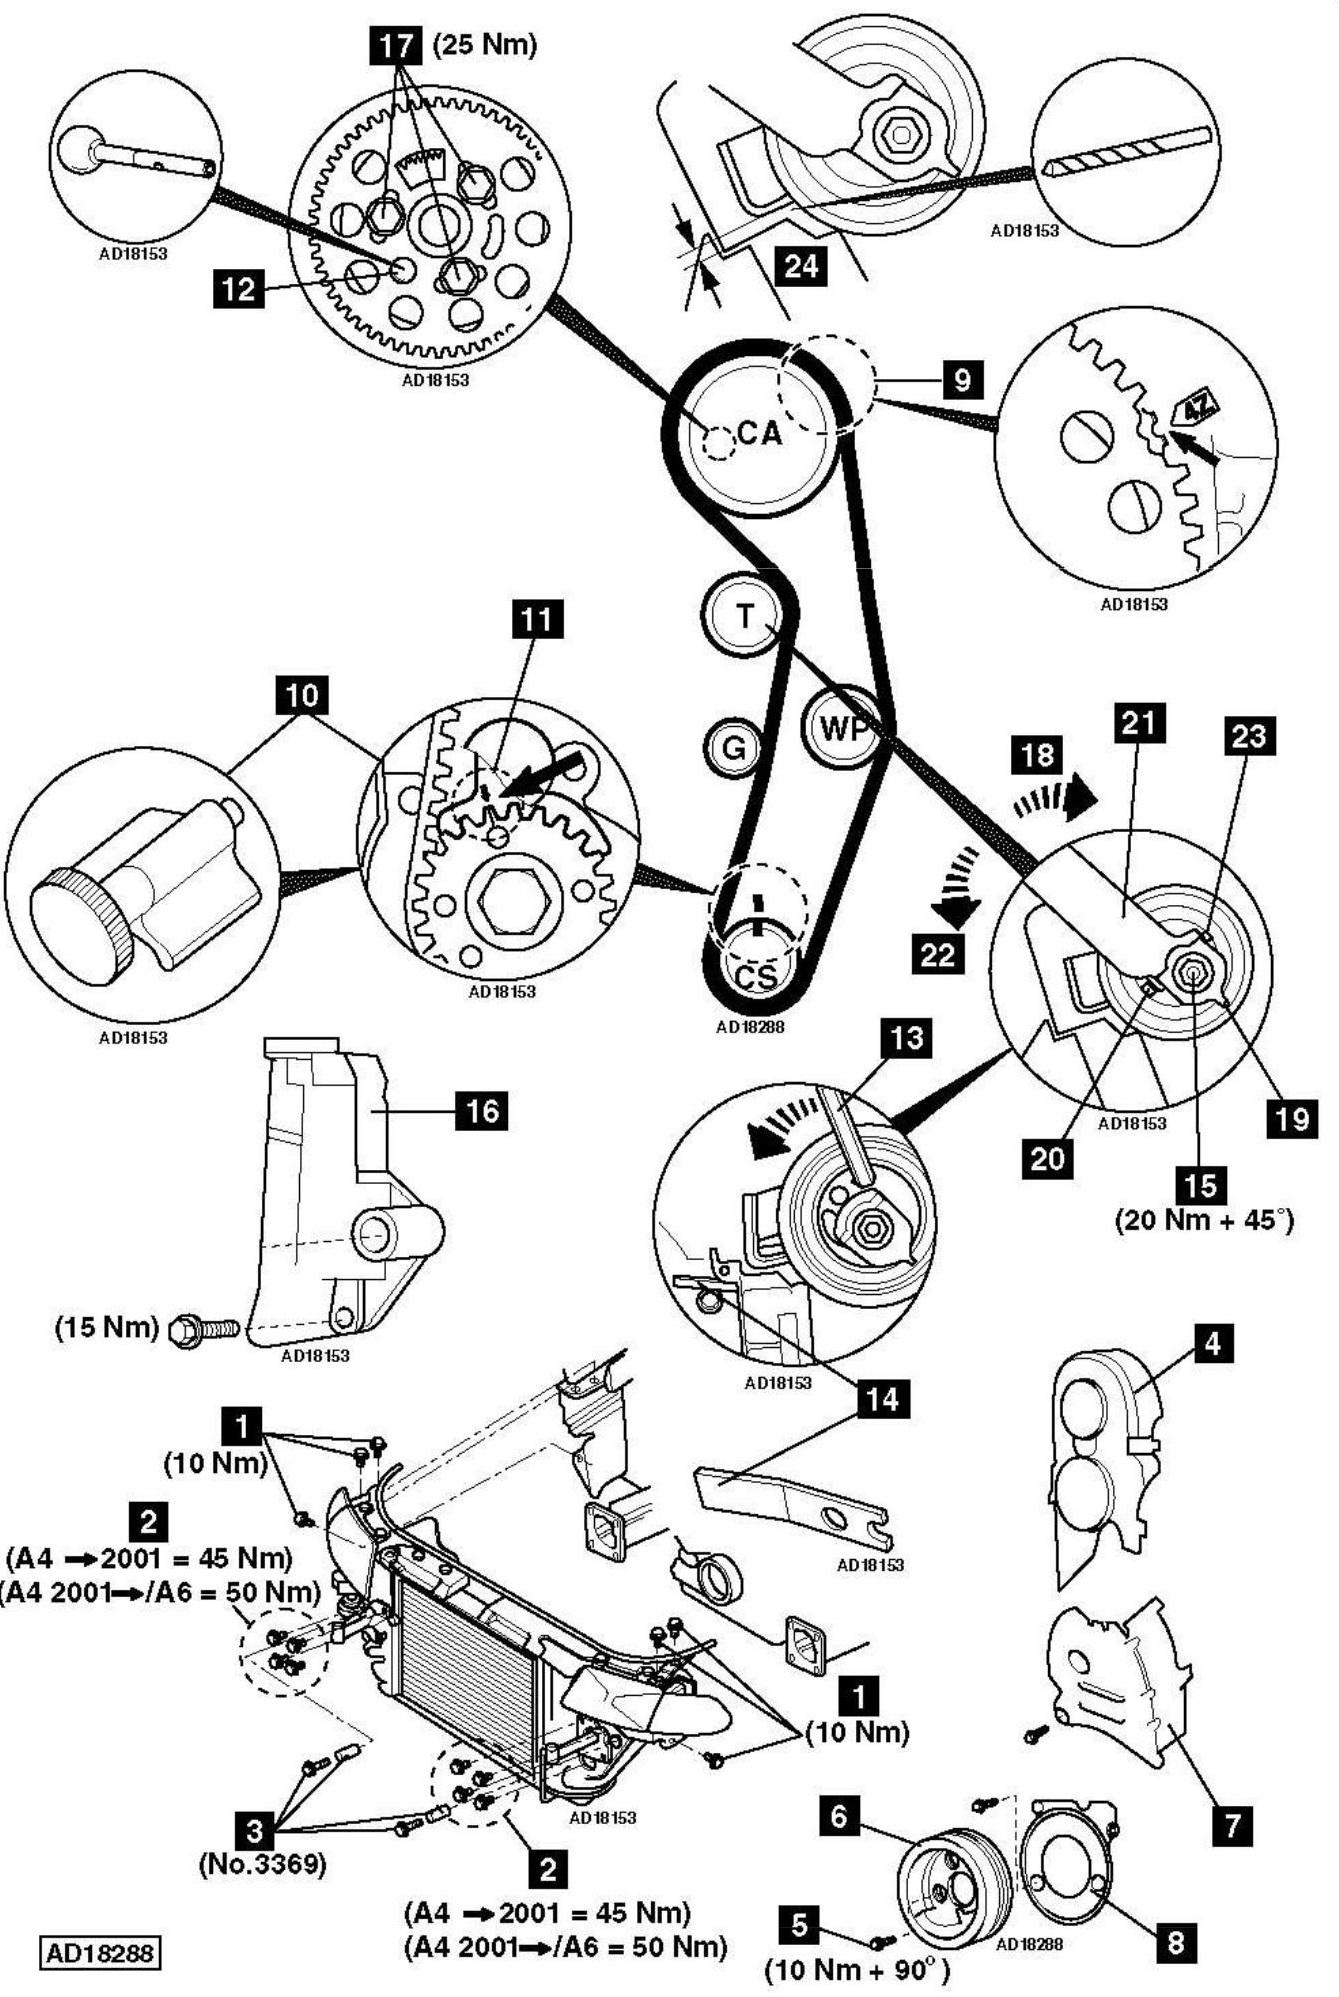 Replace-timing-chain-on-Audi-A4-B6-1-9-TDI-2001